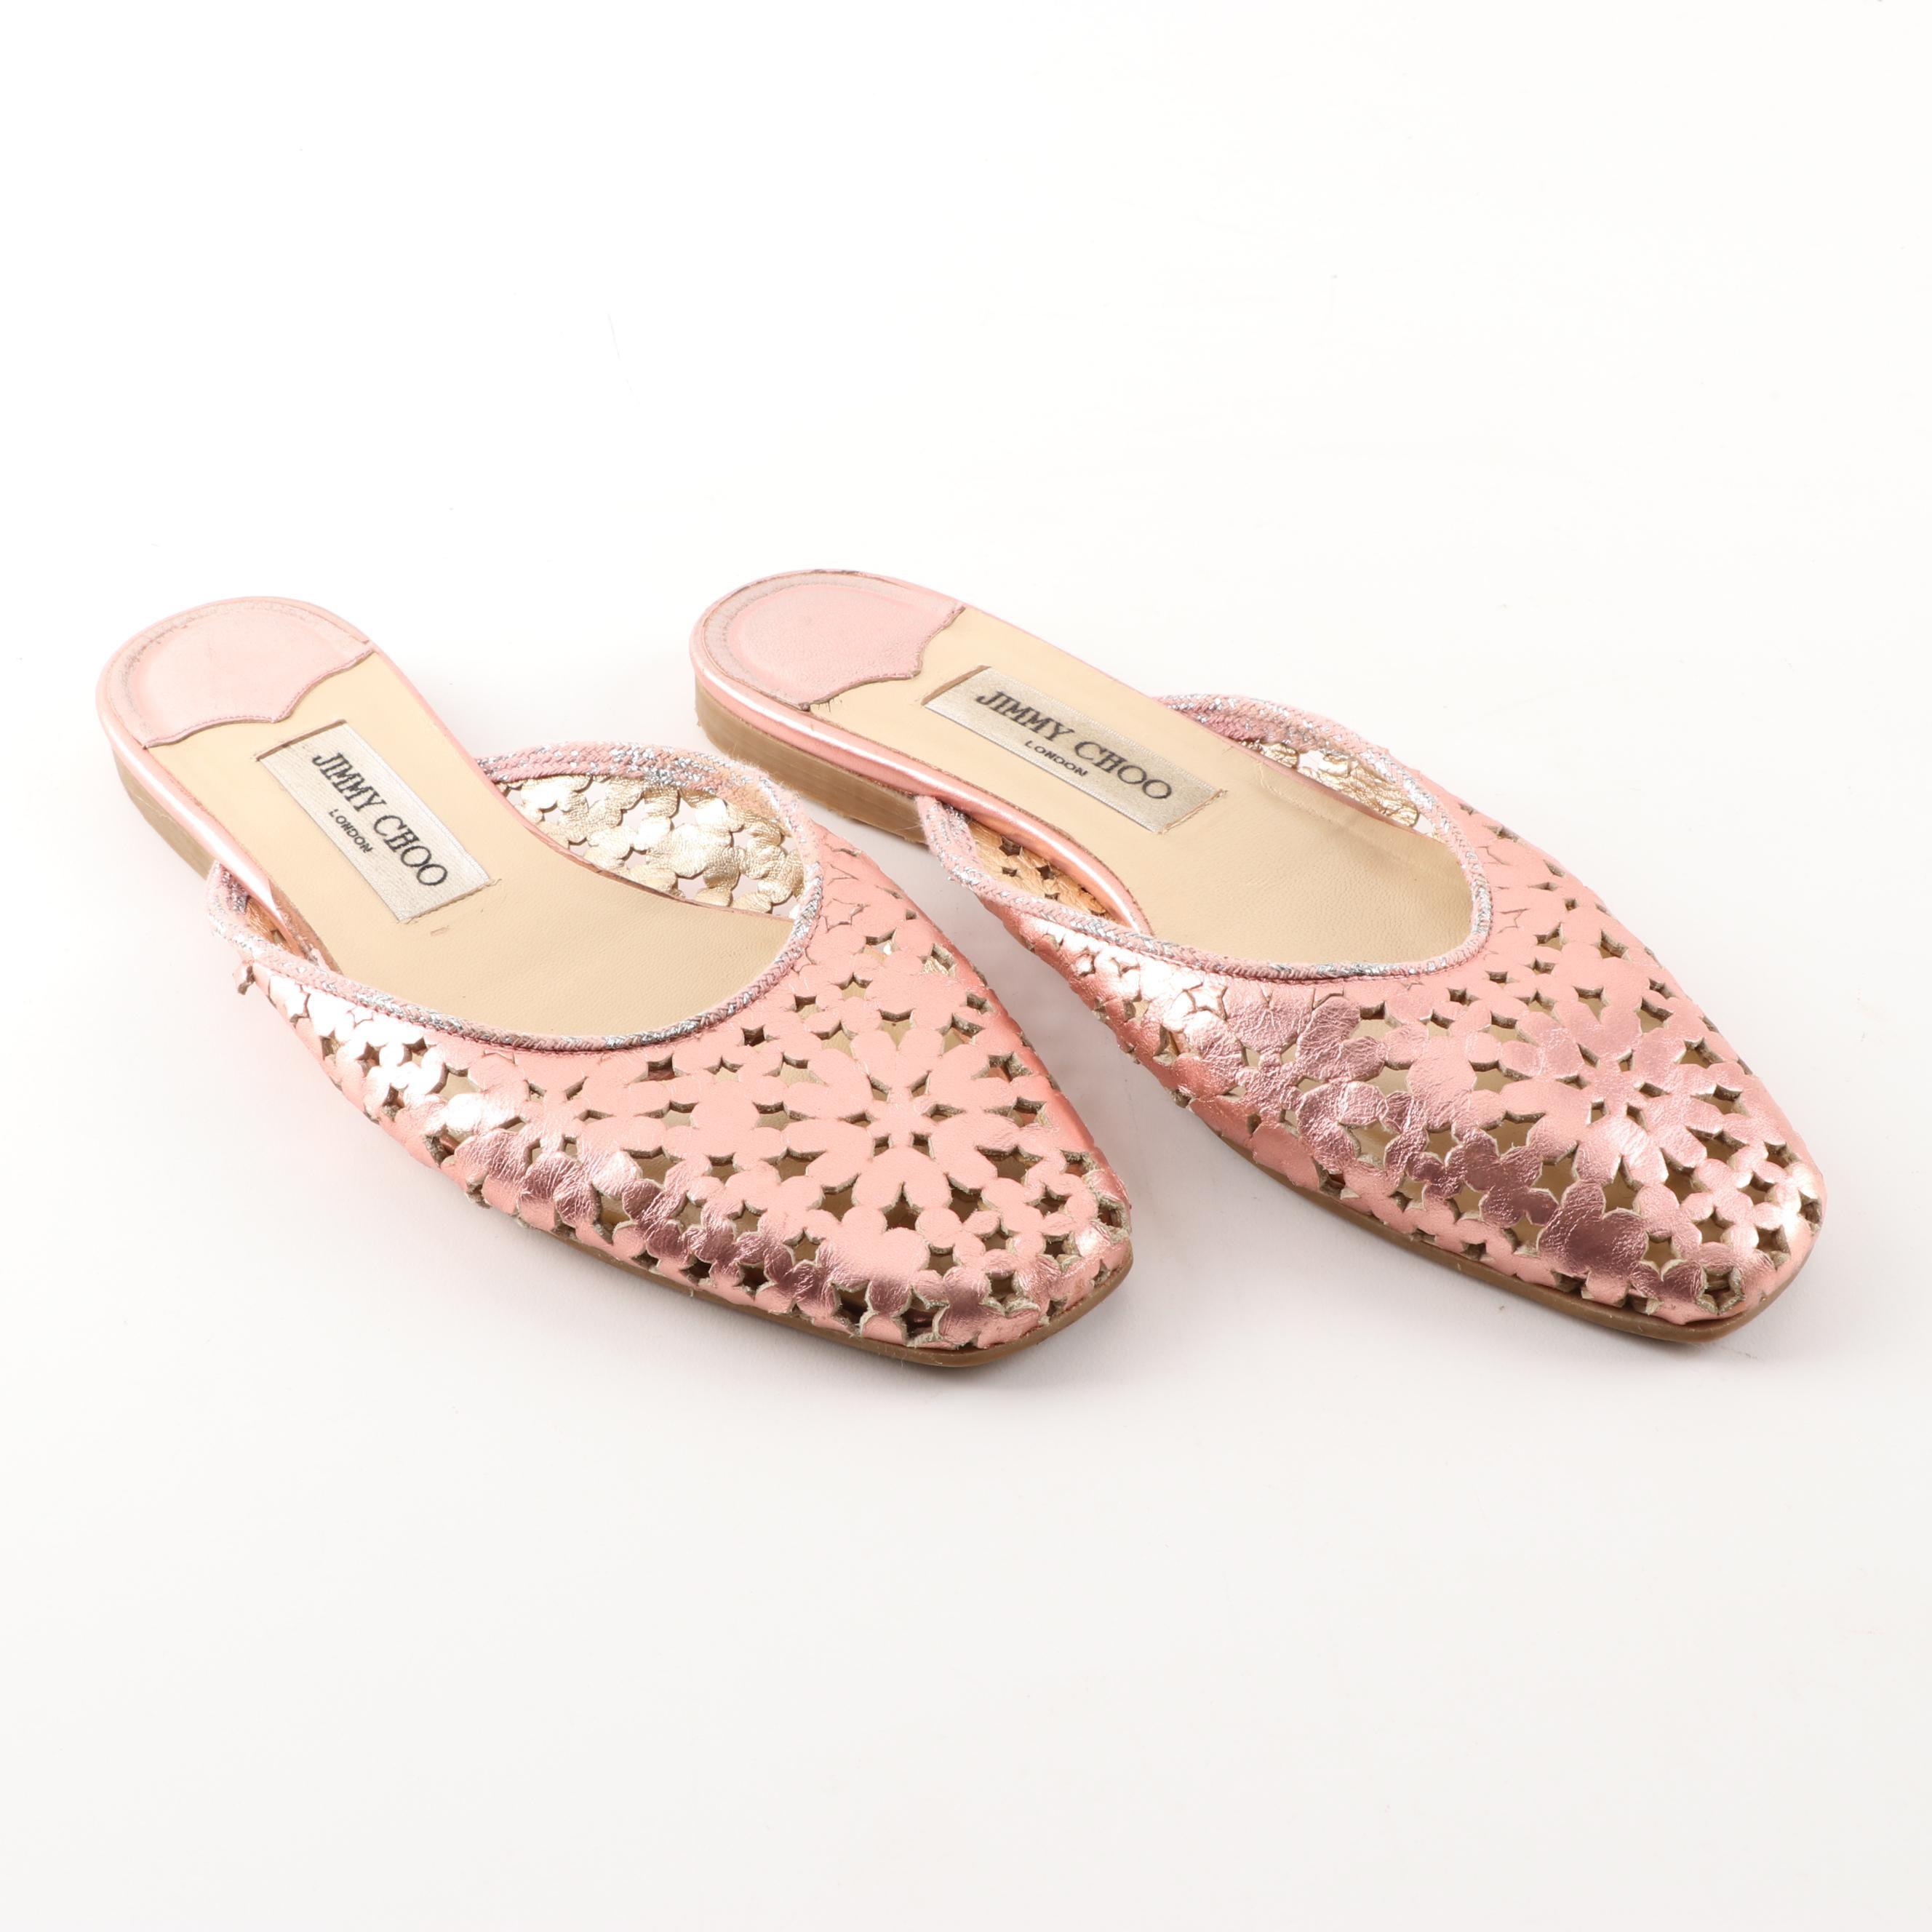 Women's Jimmy Choo London Pink Metallic Leather Slides